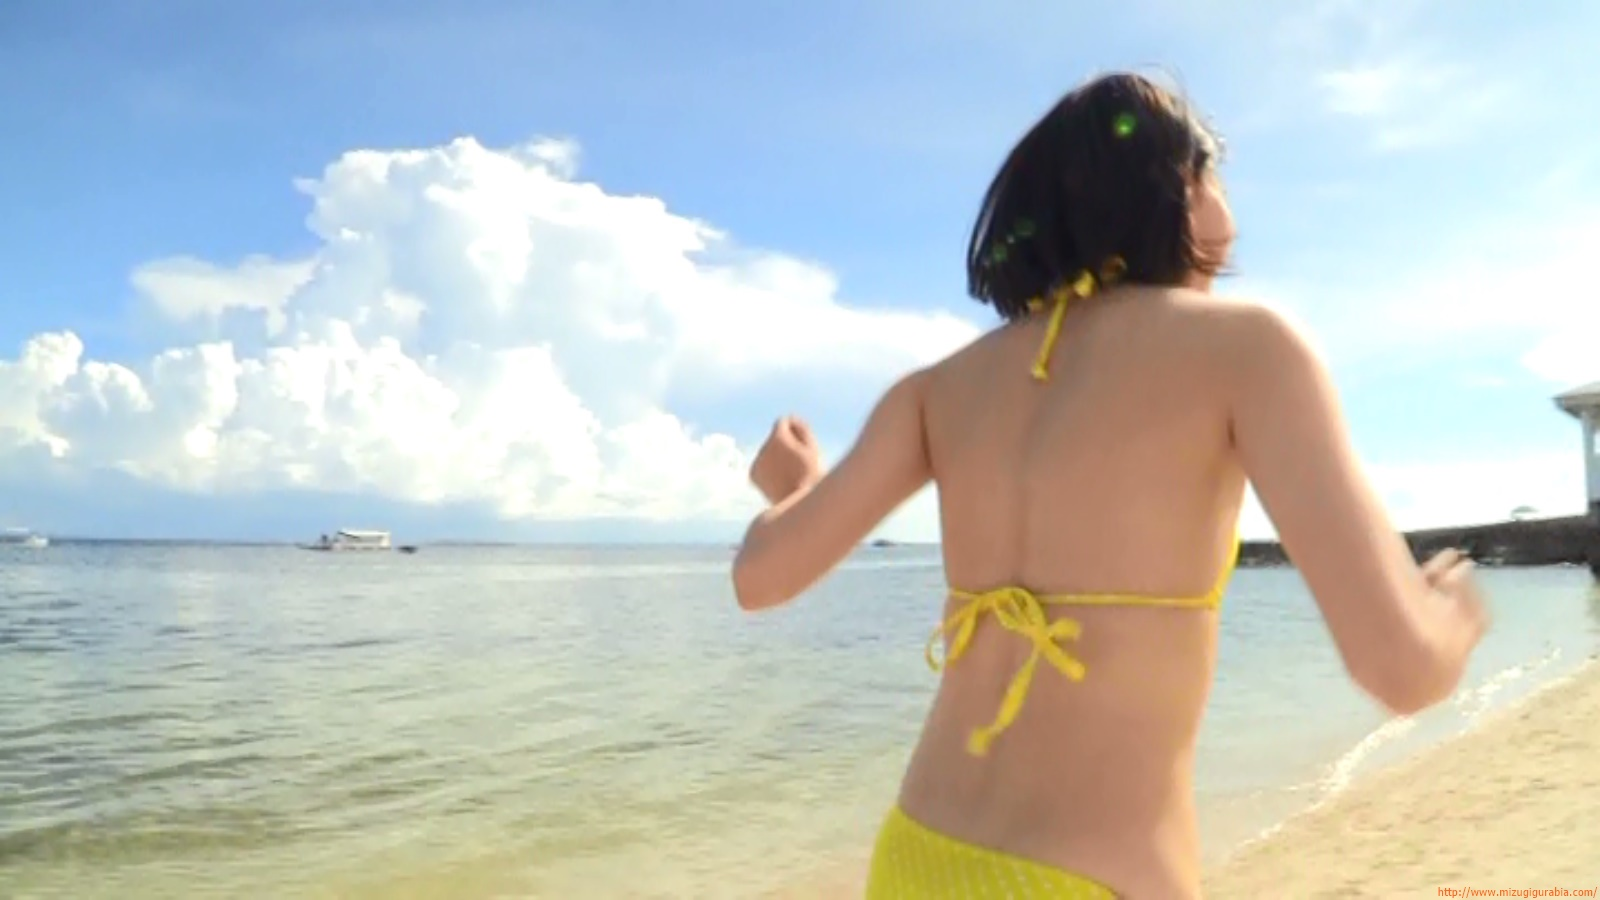 Beach dating149